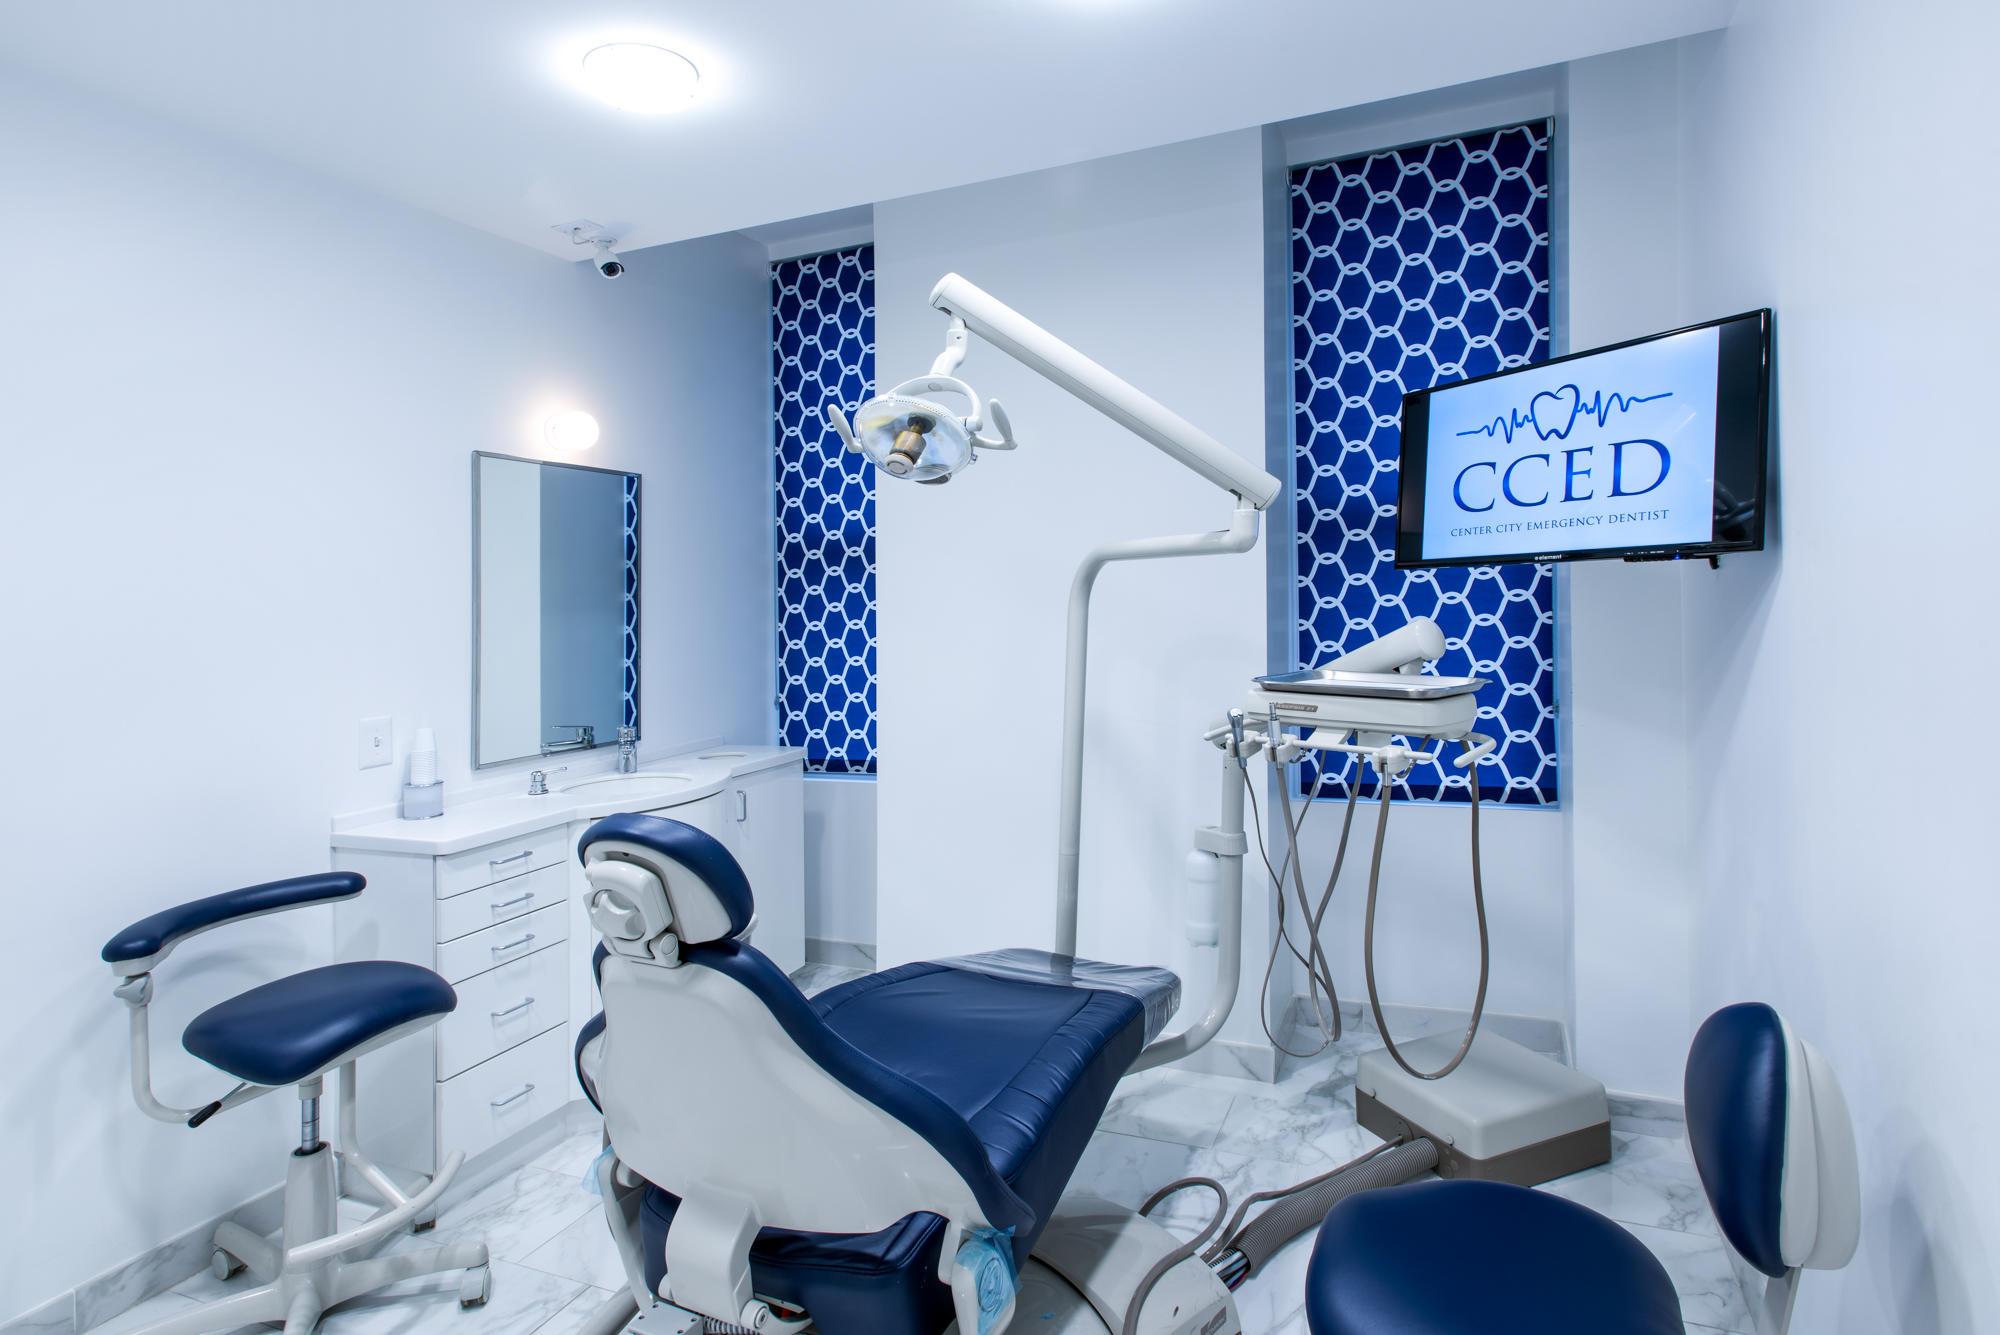 Center City Emergency Dentist image 5